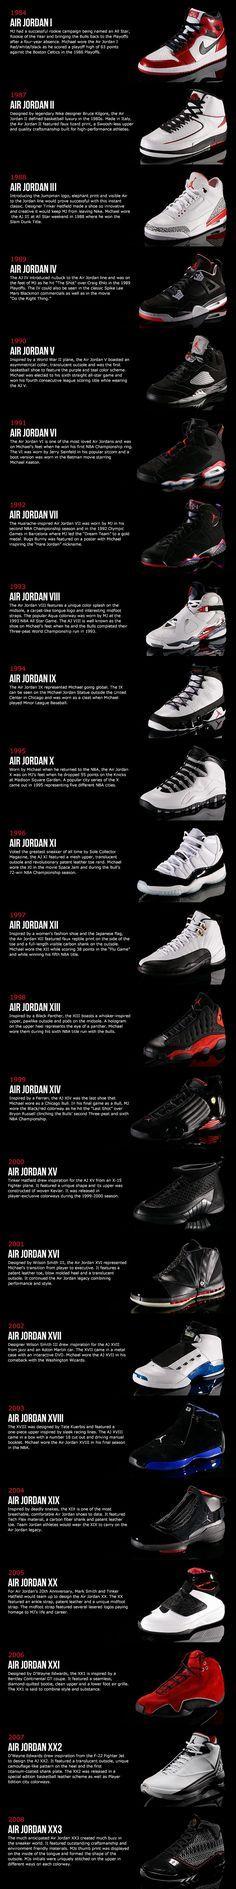 History of Air Jordan Shoes